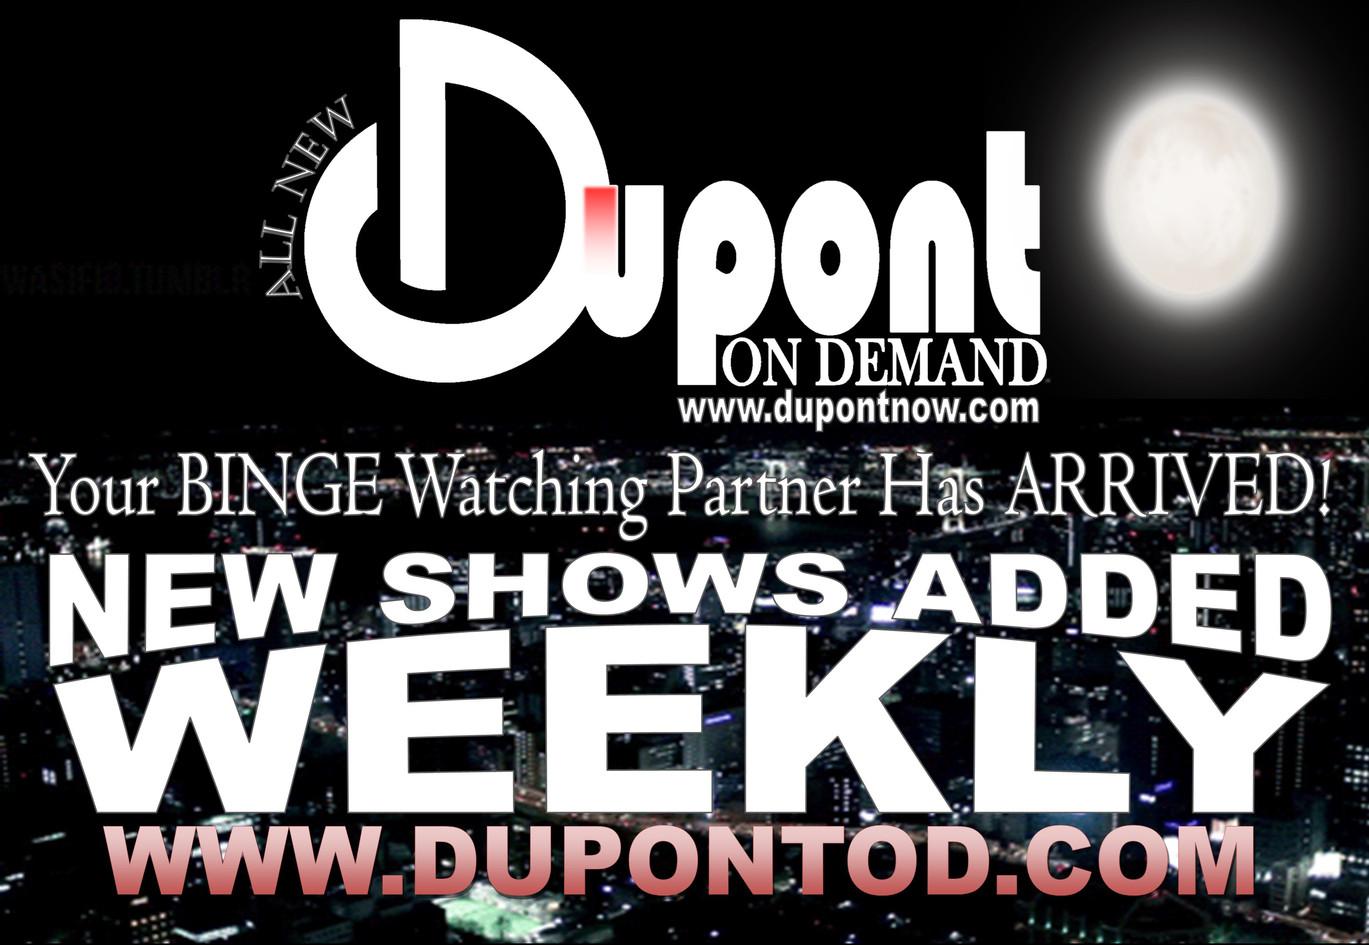 Dupont On Demand